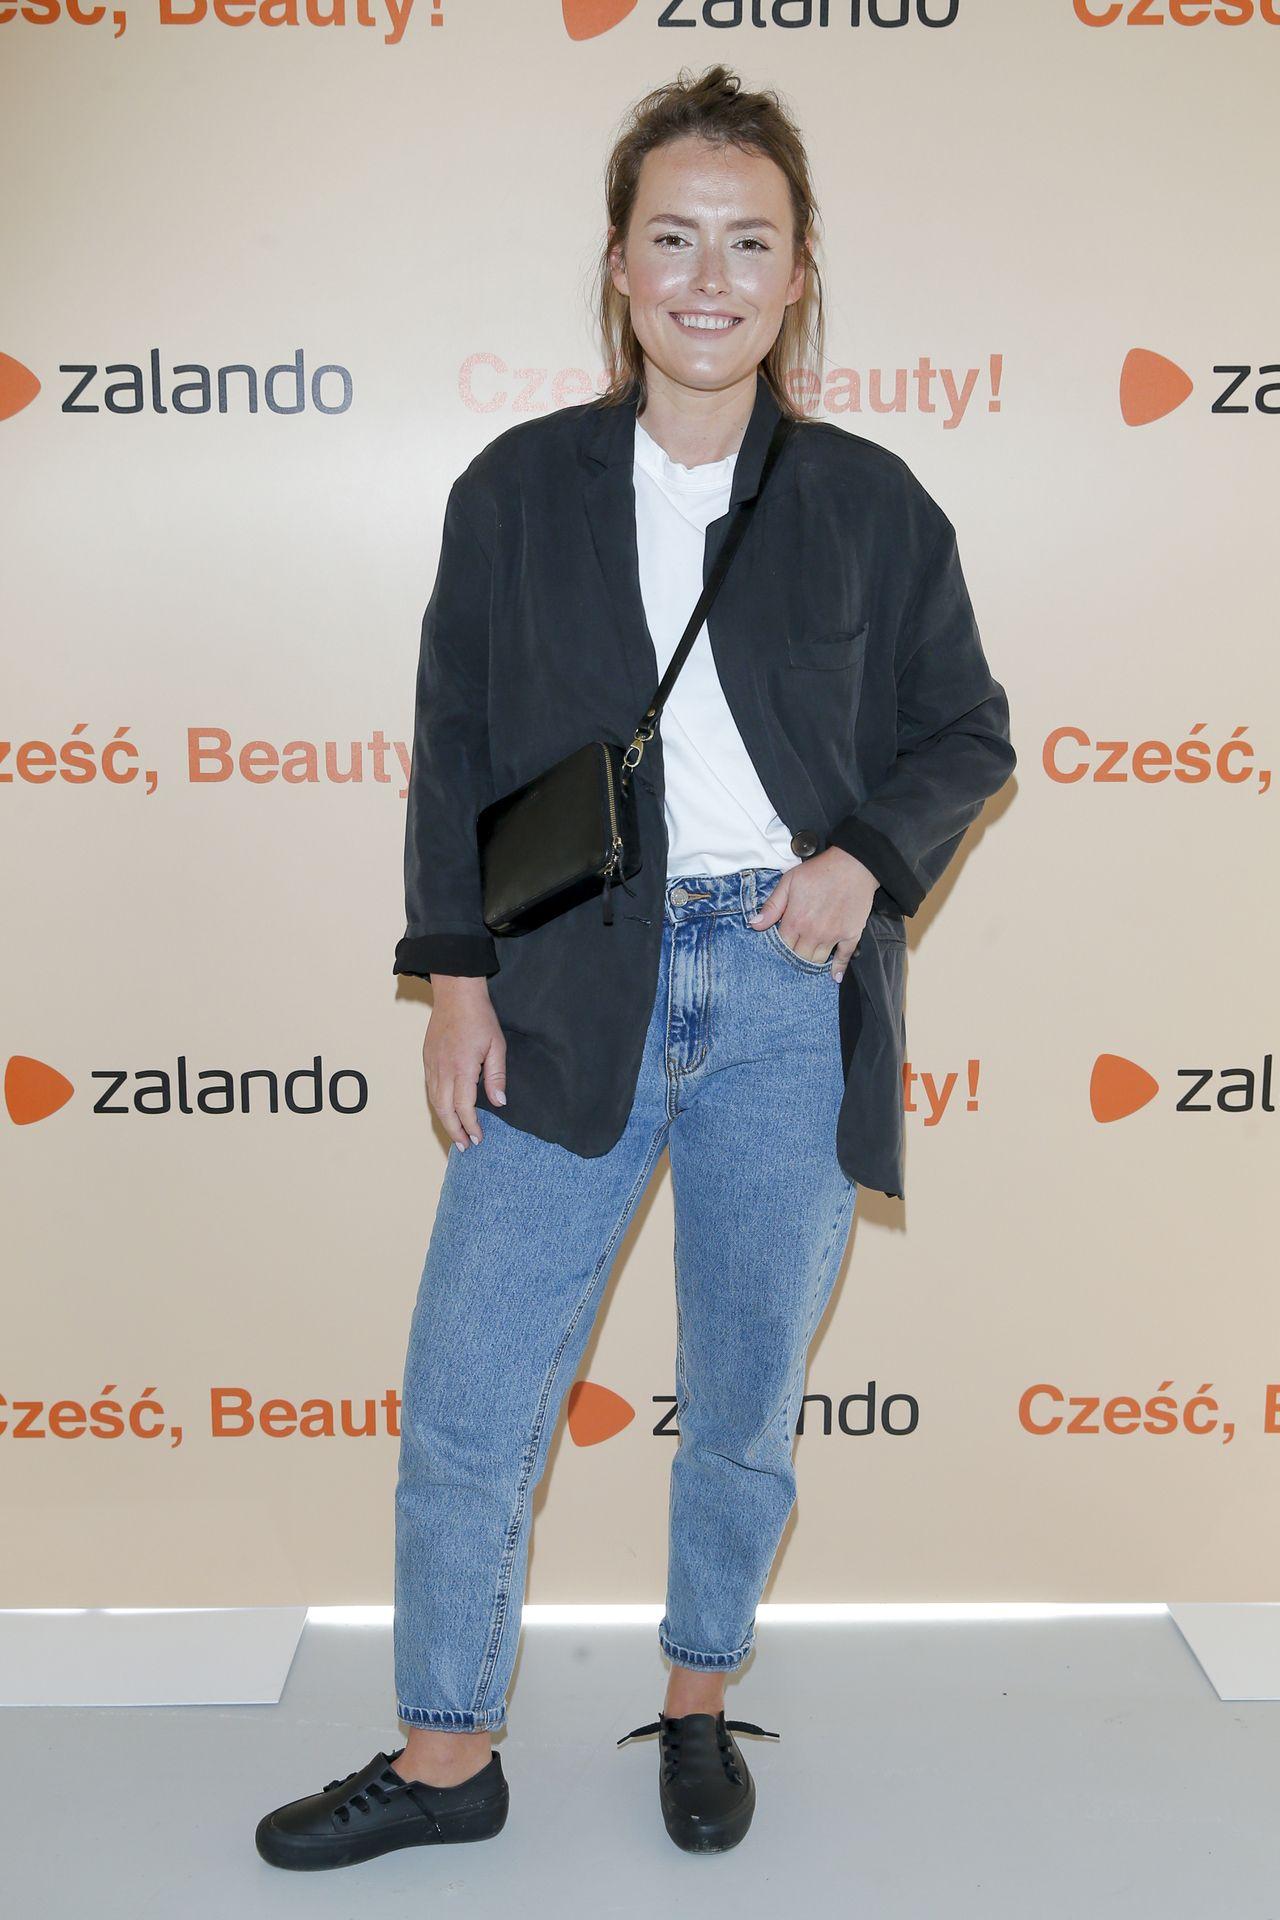 Olga Frycz na evencie Zalando